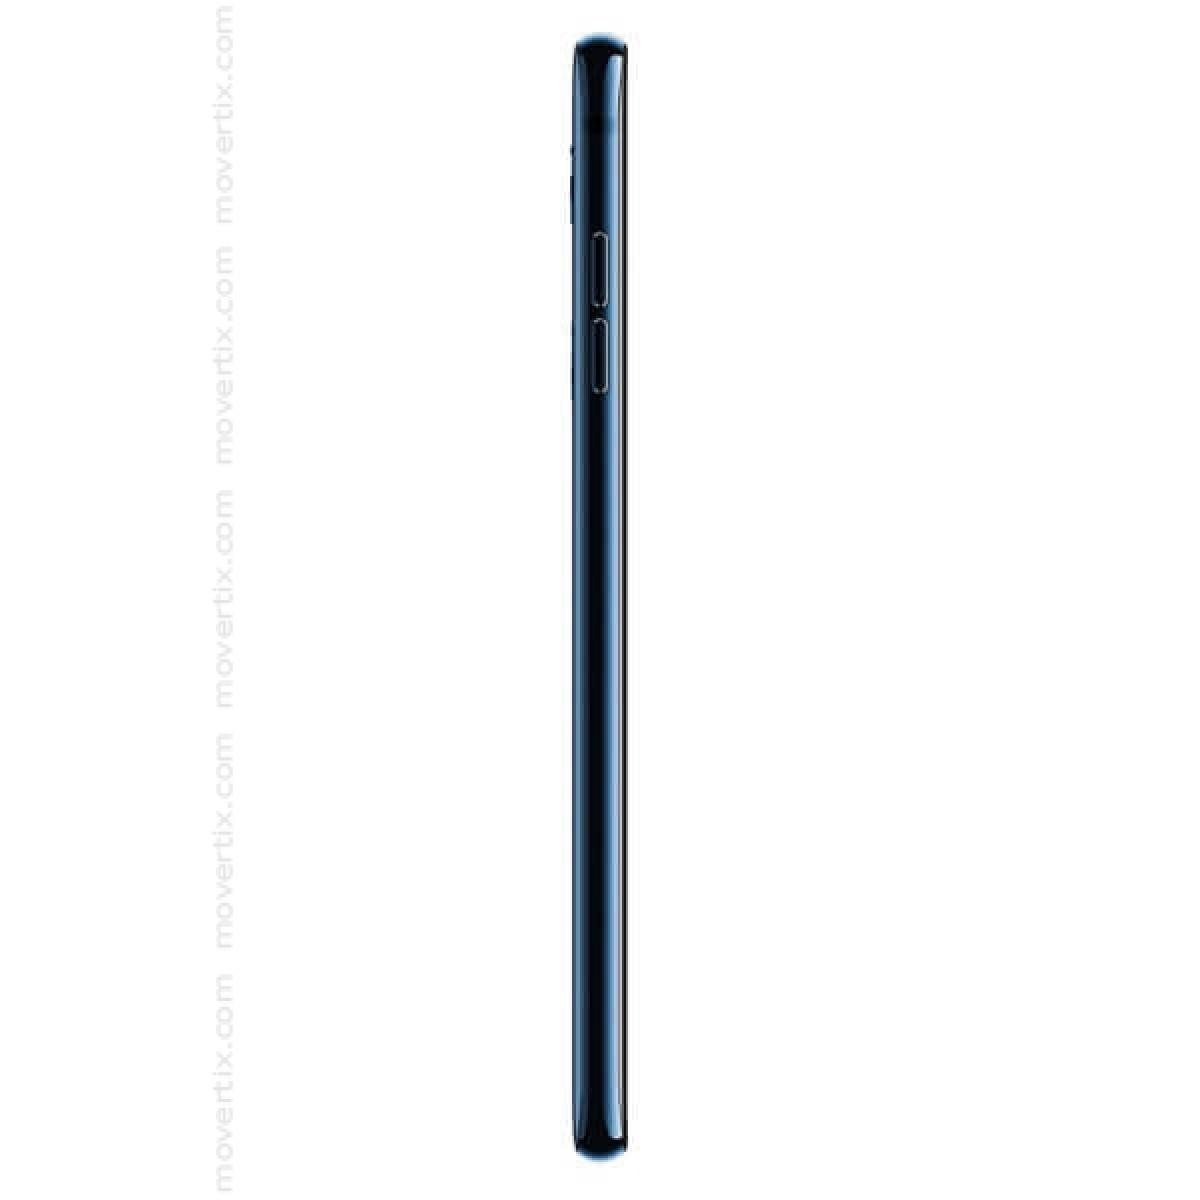 LG V30 Blue 64GB and 4GB RAM (H930)